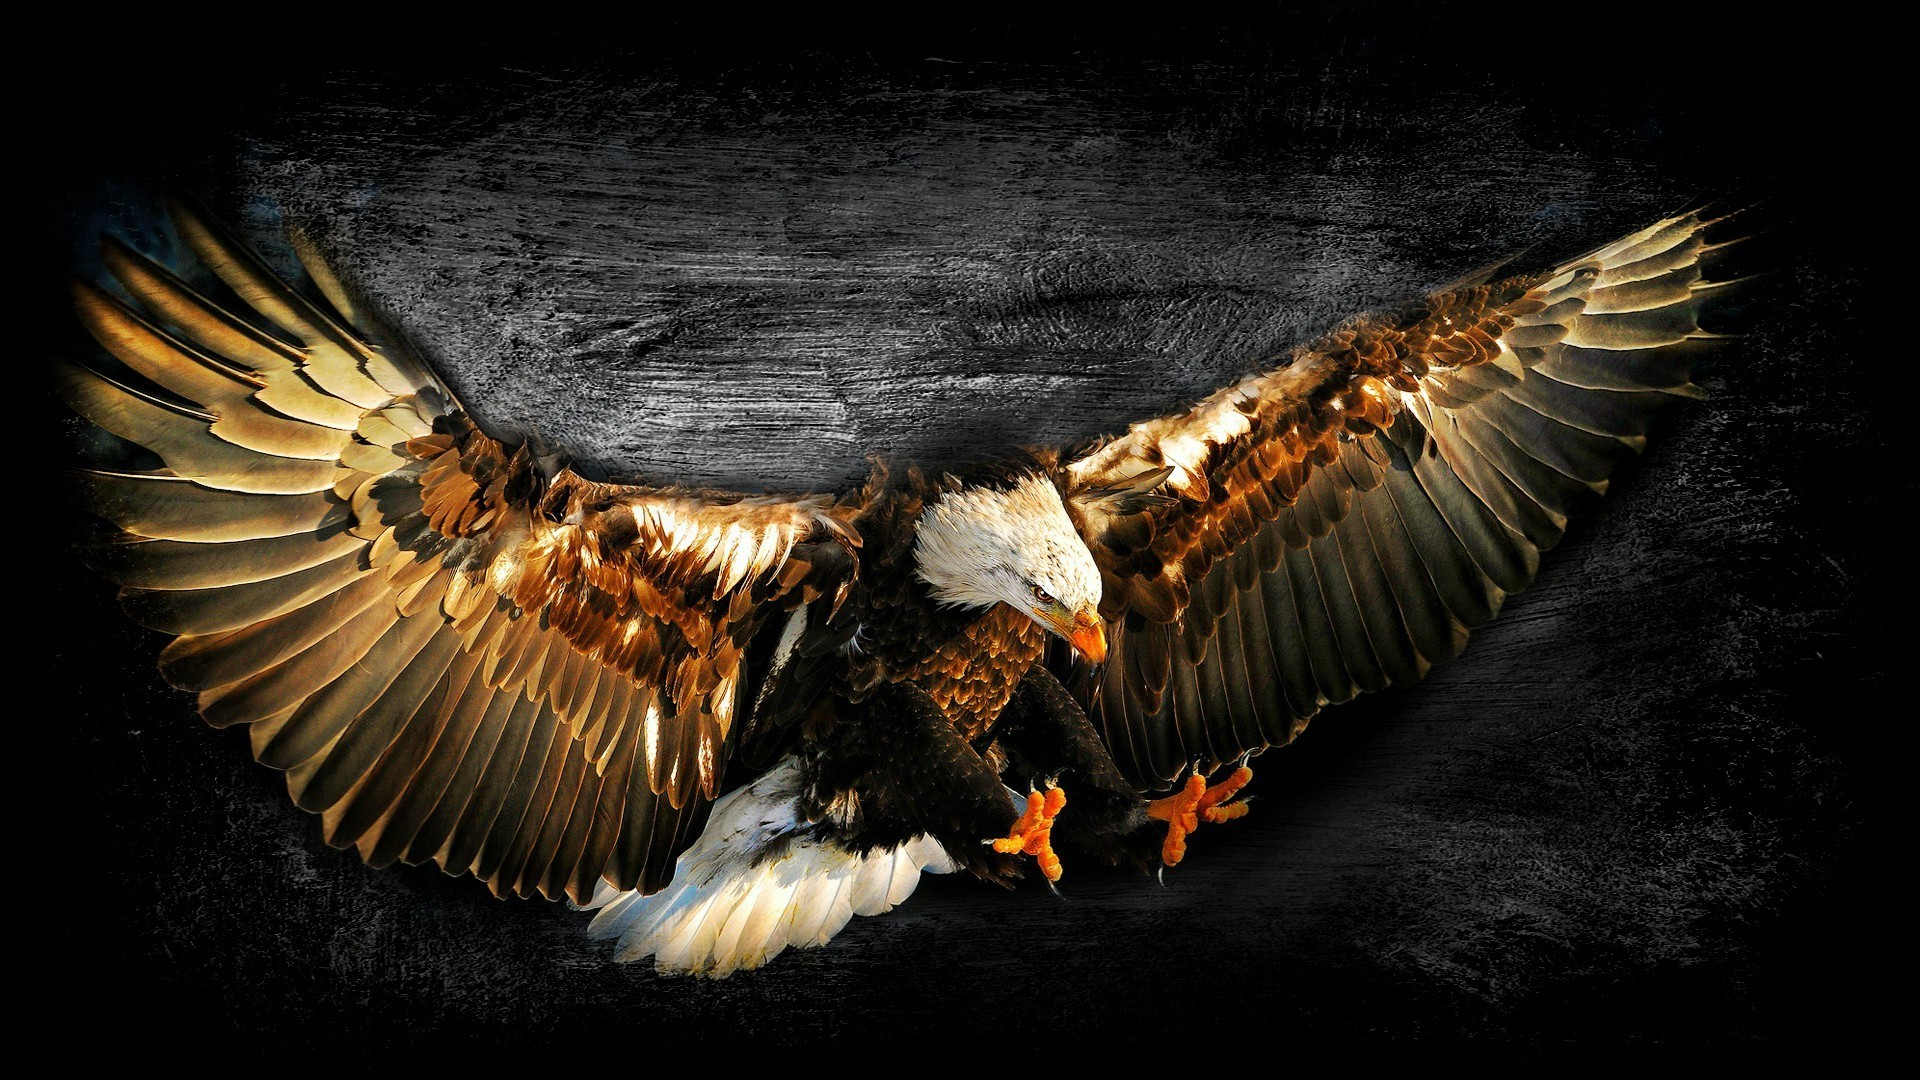 Res: 1920x1080, Bald eagle work of art wallpaper